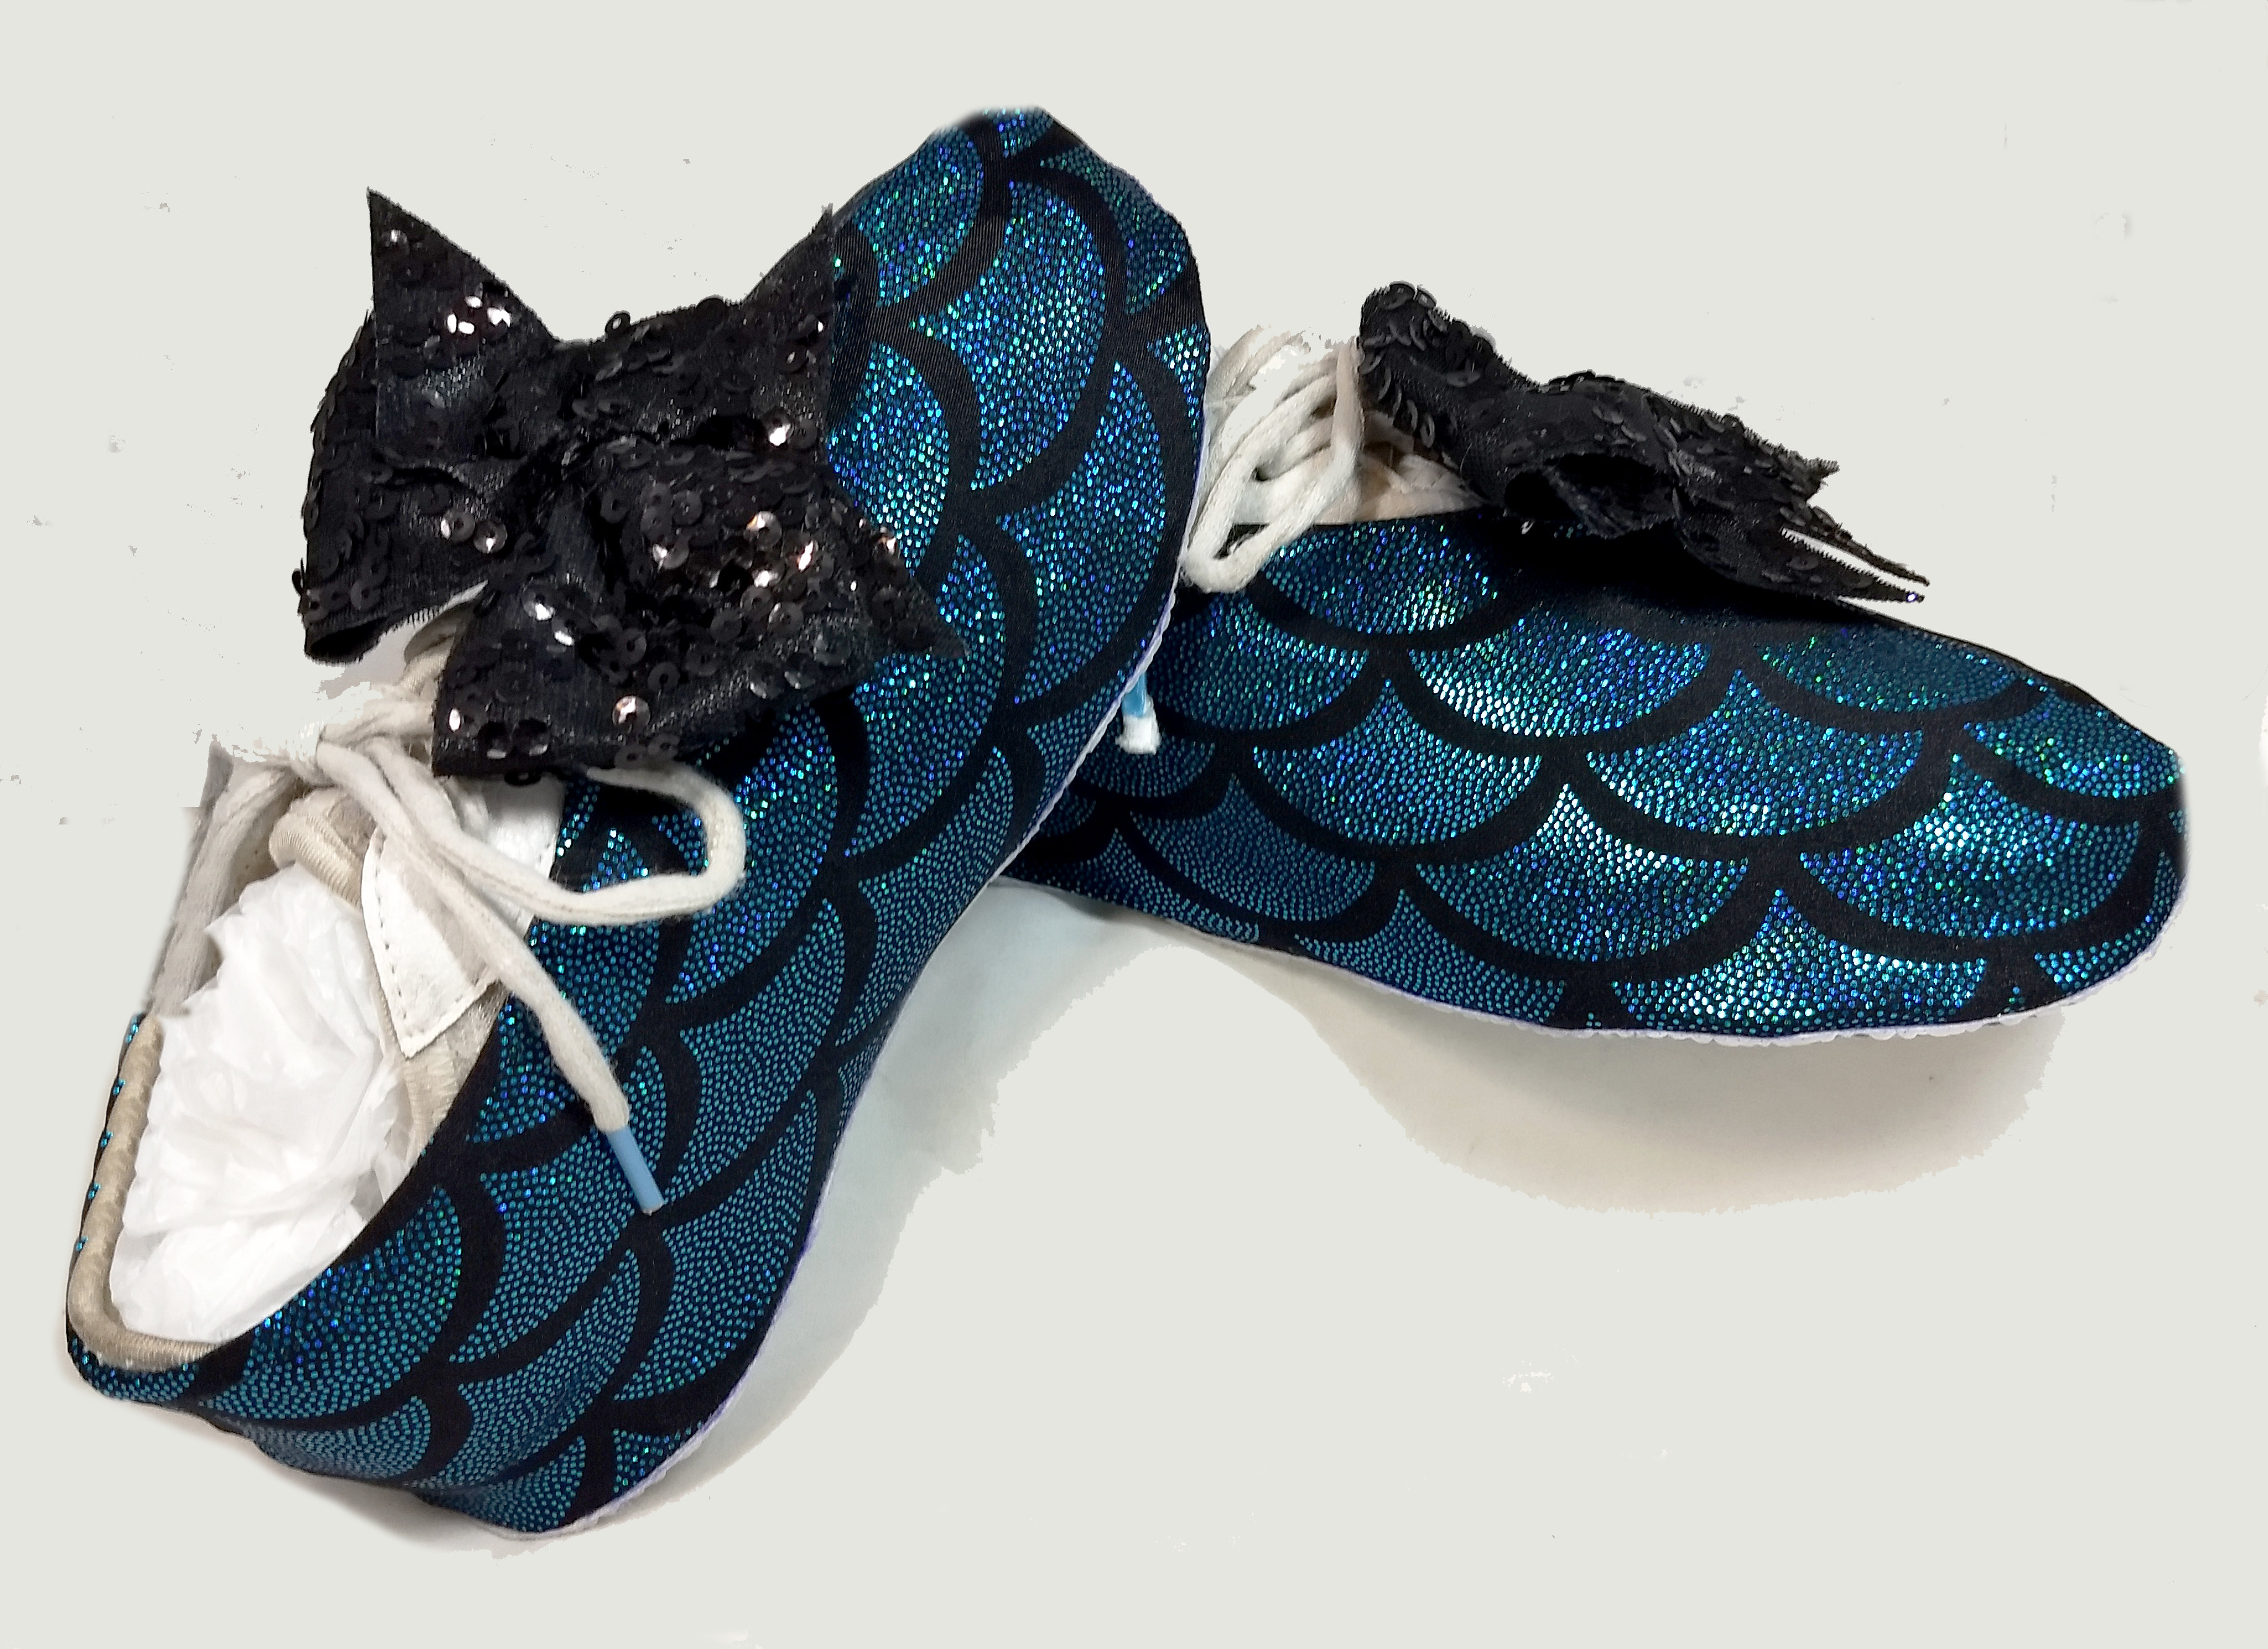 Cheerful Mermaid Cheer Shoe Covers SW-MER